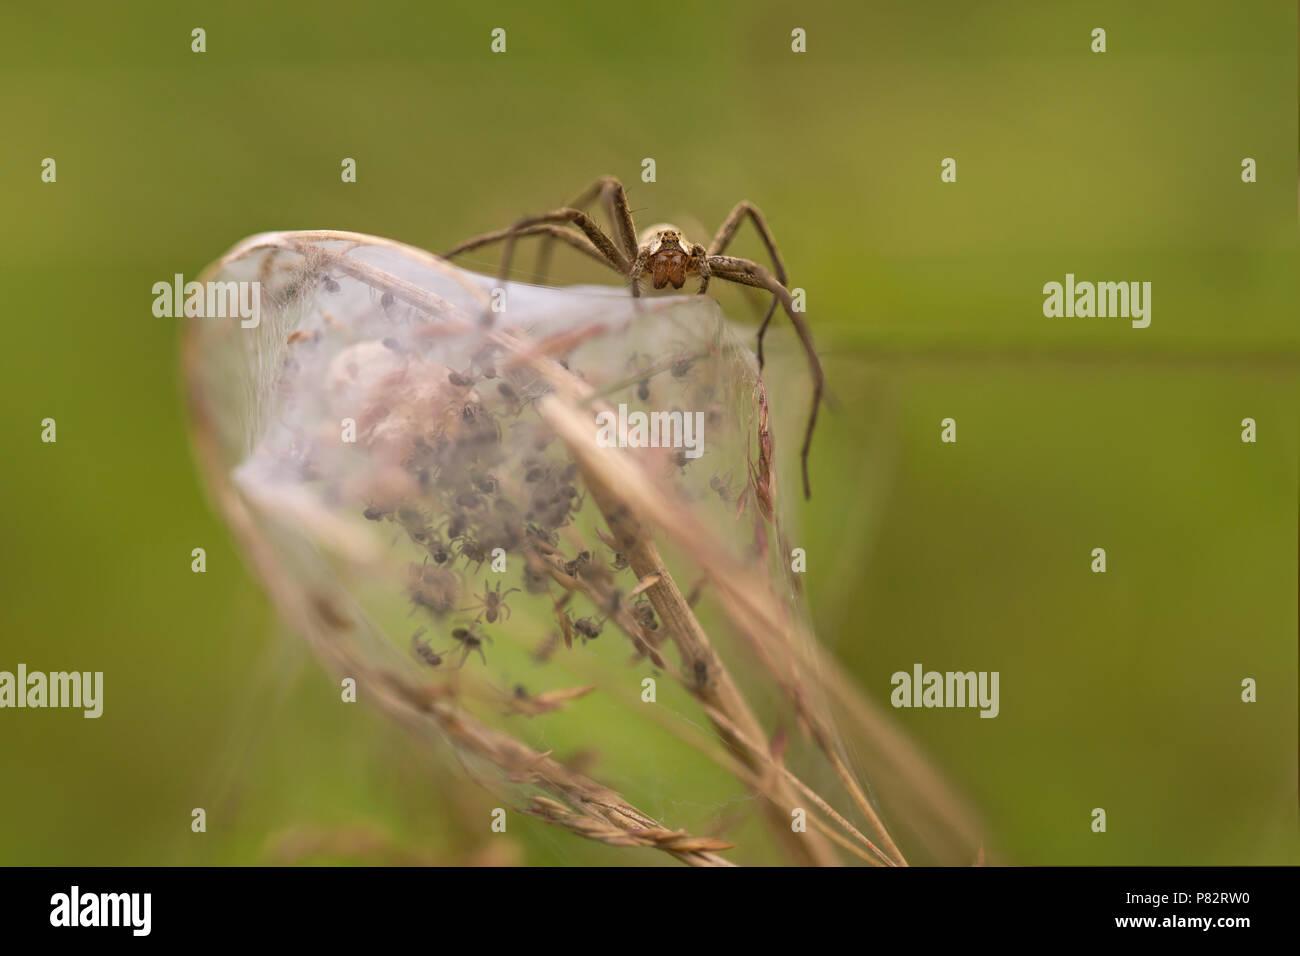 Kraamwebspin op haar kraamweb; Nursery Web Spider on her nursery web - Stock Image